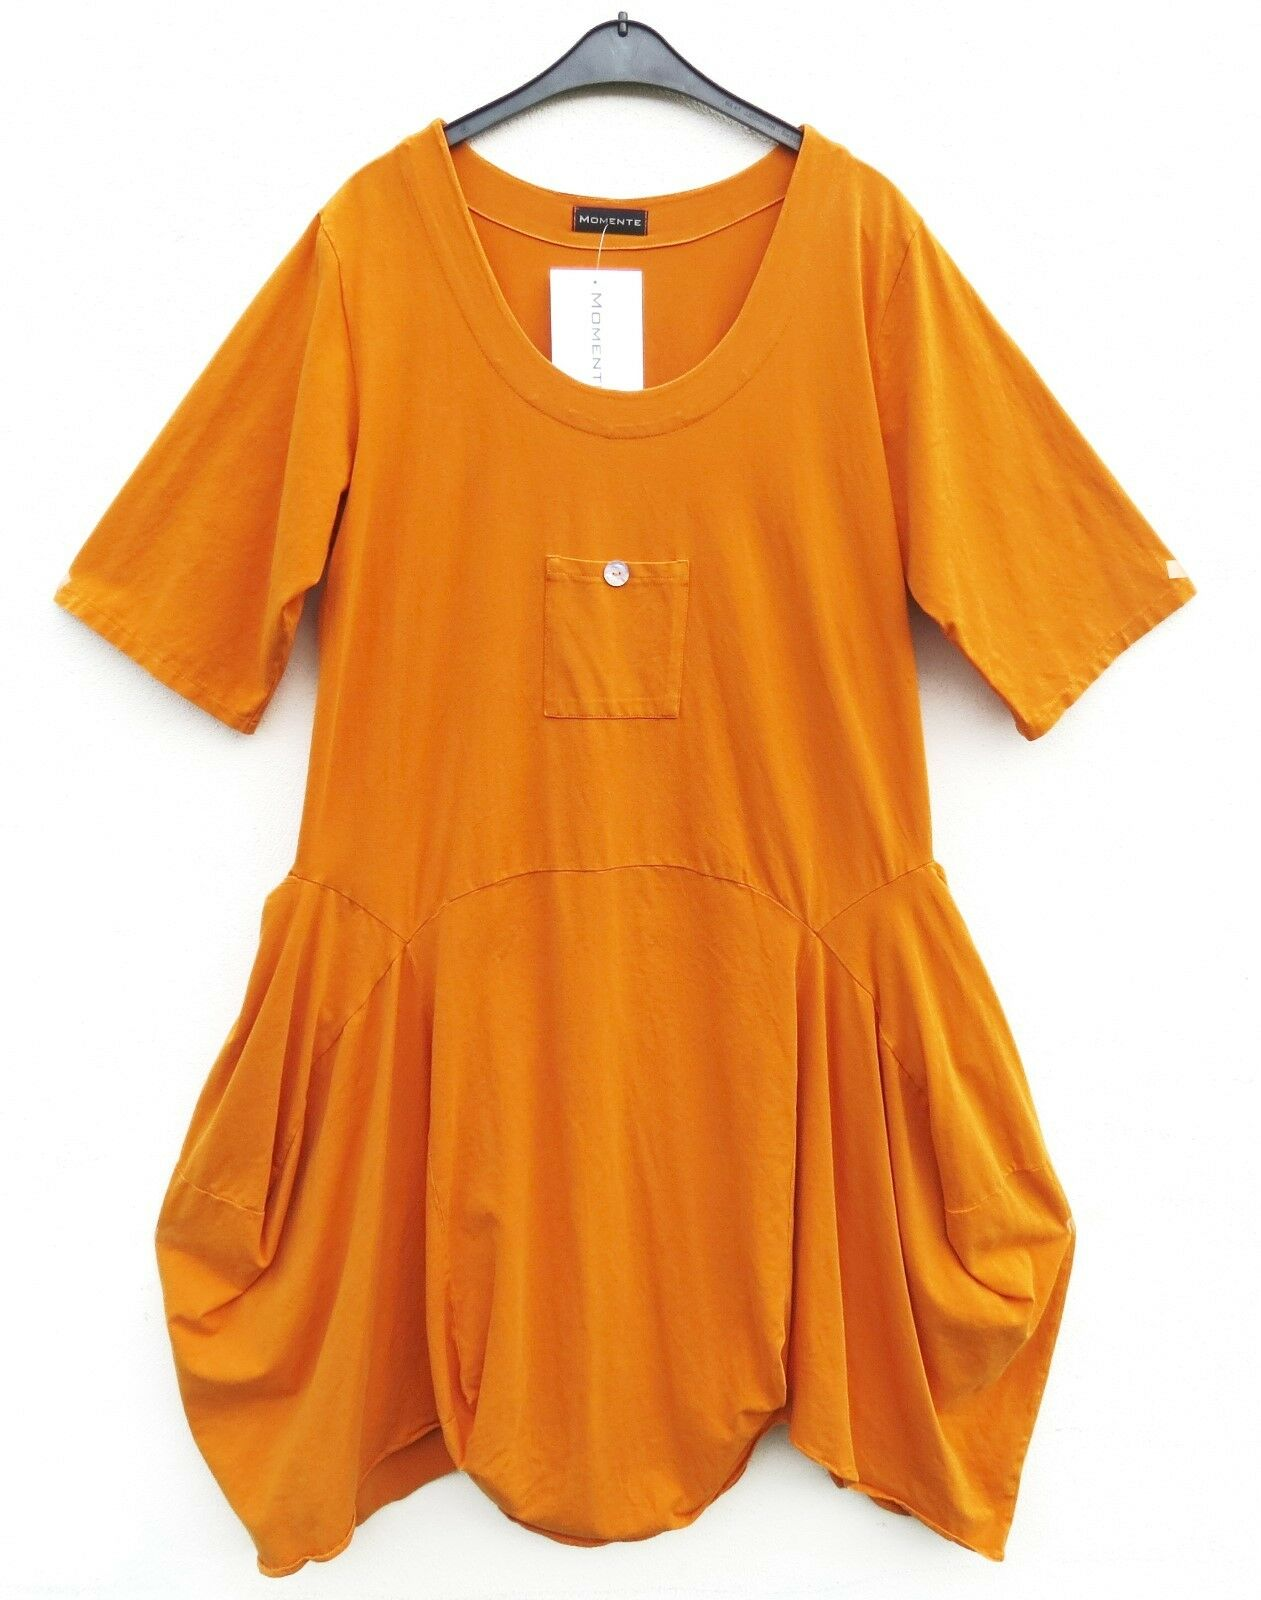 NEU MOMännerTE Sommer Kleid Kleid Robe Vestido XL 48 50 Lagenlook